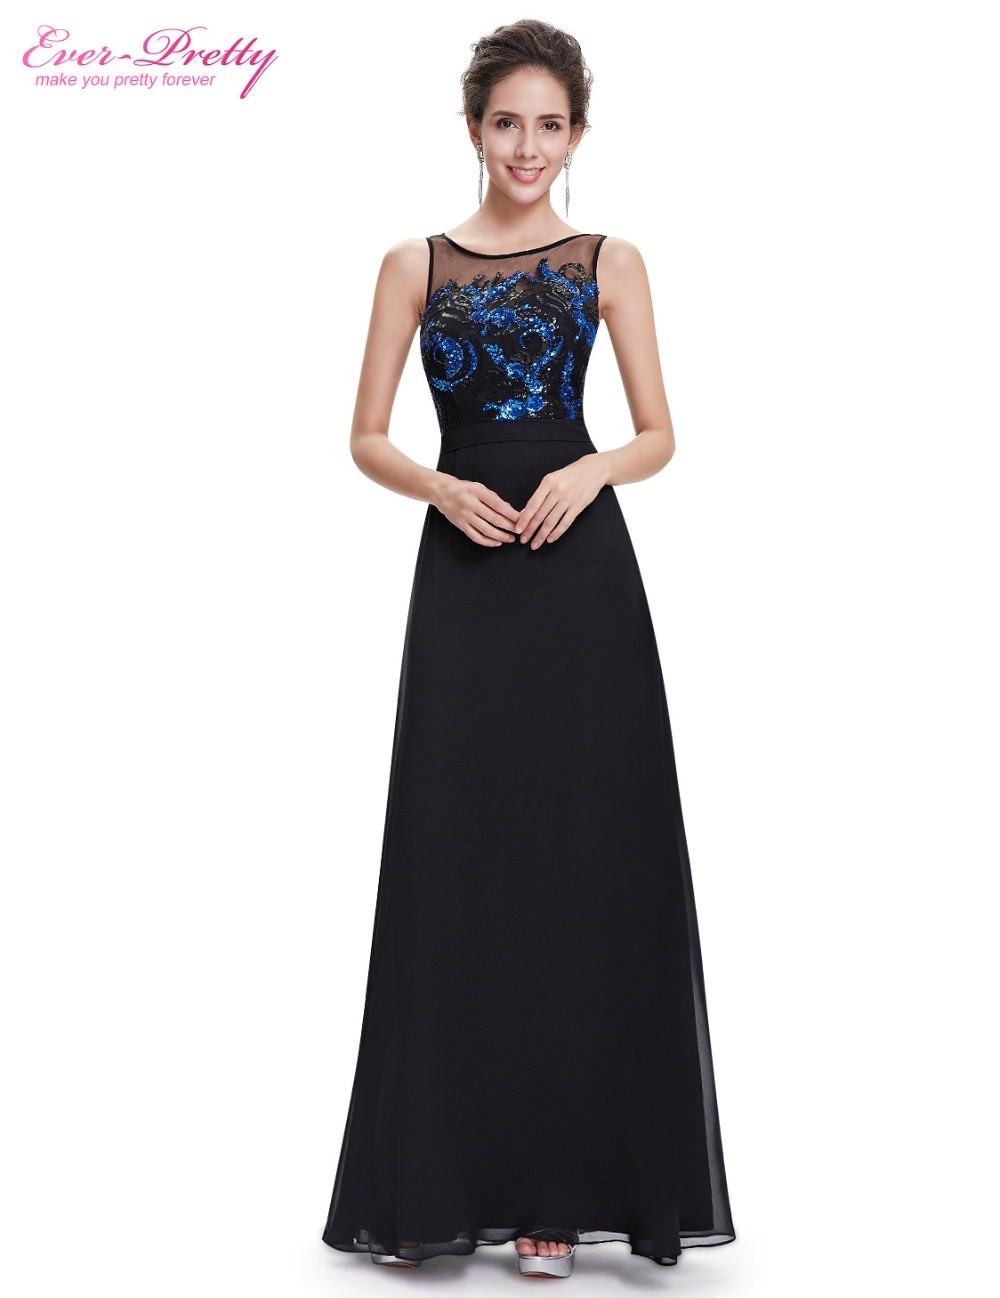 ⑤[Clearance Sale] Formal Elegant Evening Dresses Ever Pretty ...